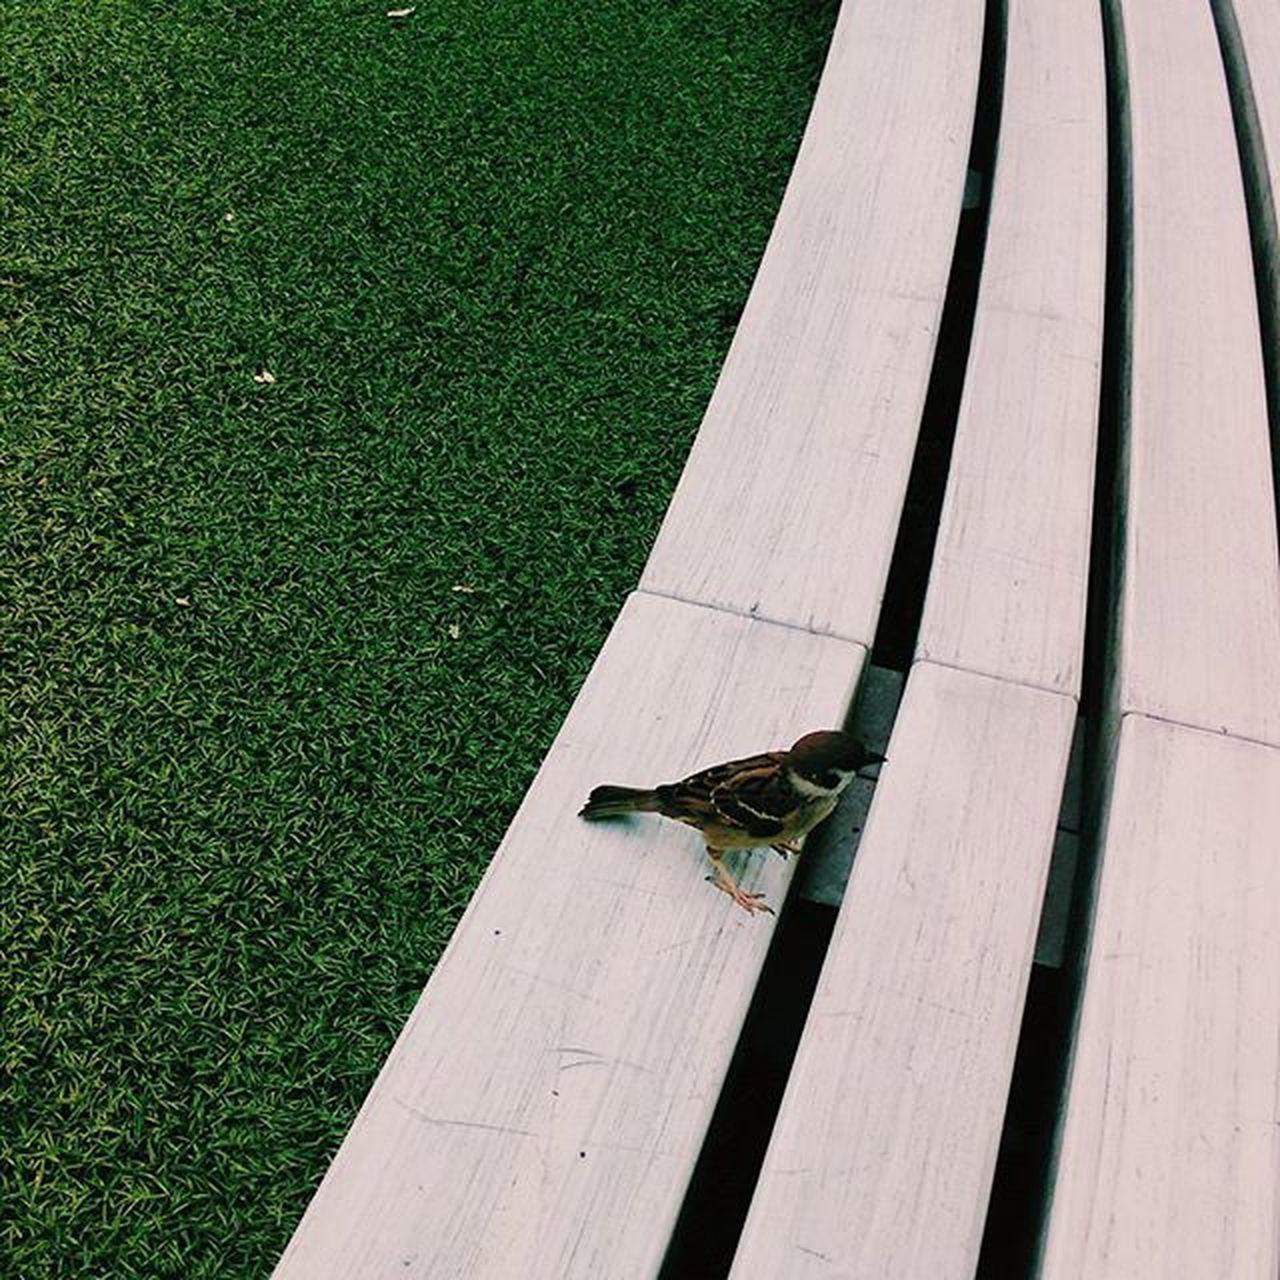 Sparrow is coming. 虎ノ門ヒルズのスズメは人間を給仕係と認識してるようです。クロワッサンを少し差し出そうとしてやめておきました。 Bird Sparrow Toranomon Toranomonhills Japan Tokyo Happy LOL Yolo Follow Instagood